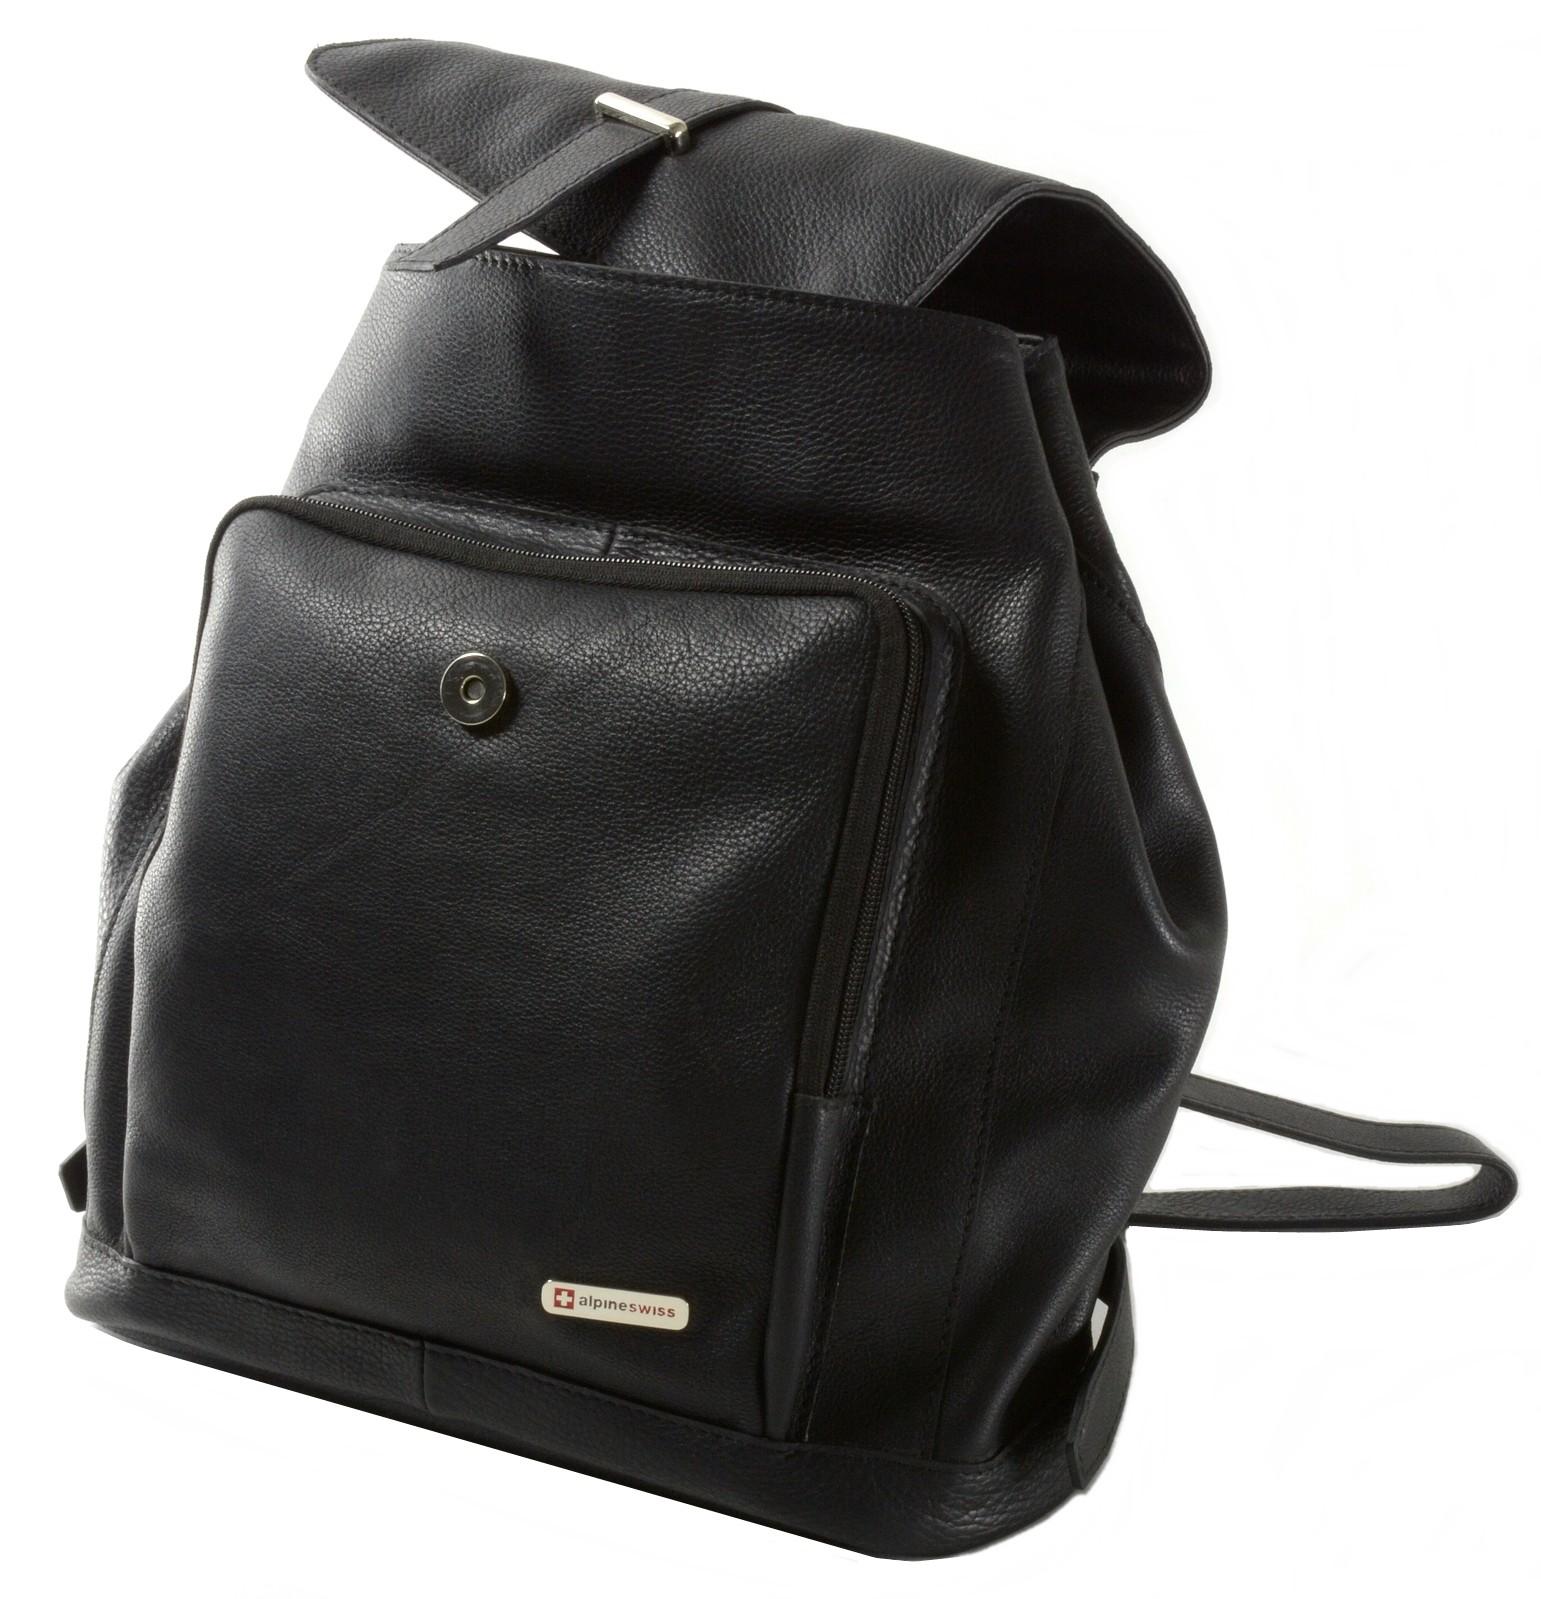 f928f12691 Alpine Swiss Monroe Leather Briefcase TopZip Laptop Messenger ... Heshe Leather  Womens Handbags ...